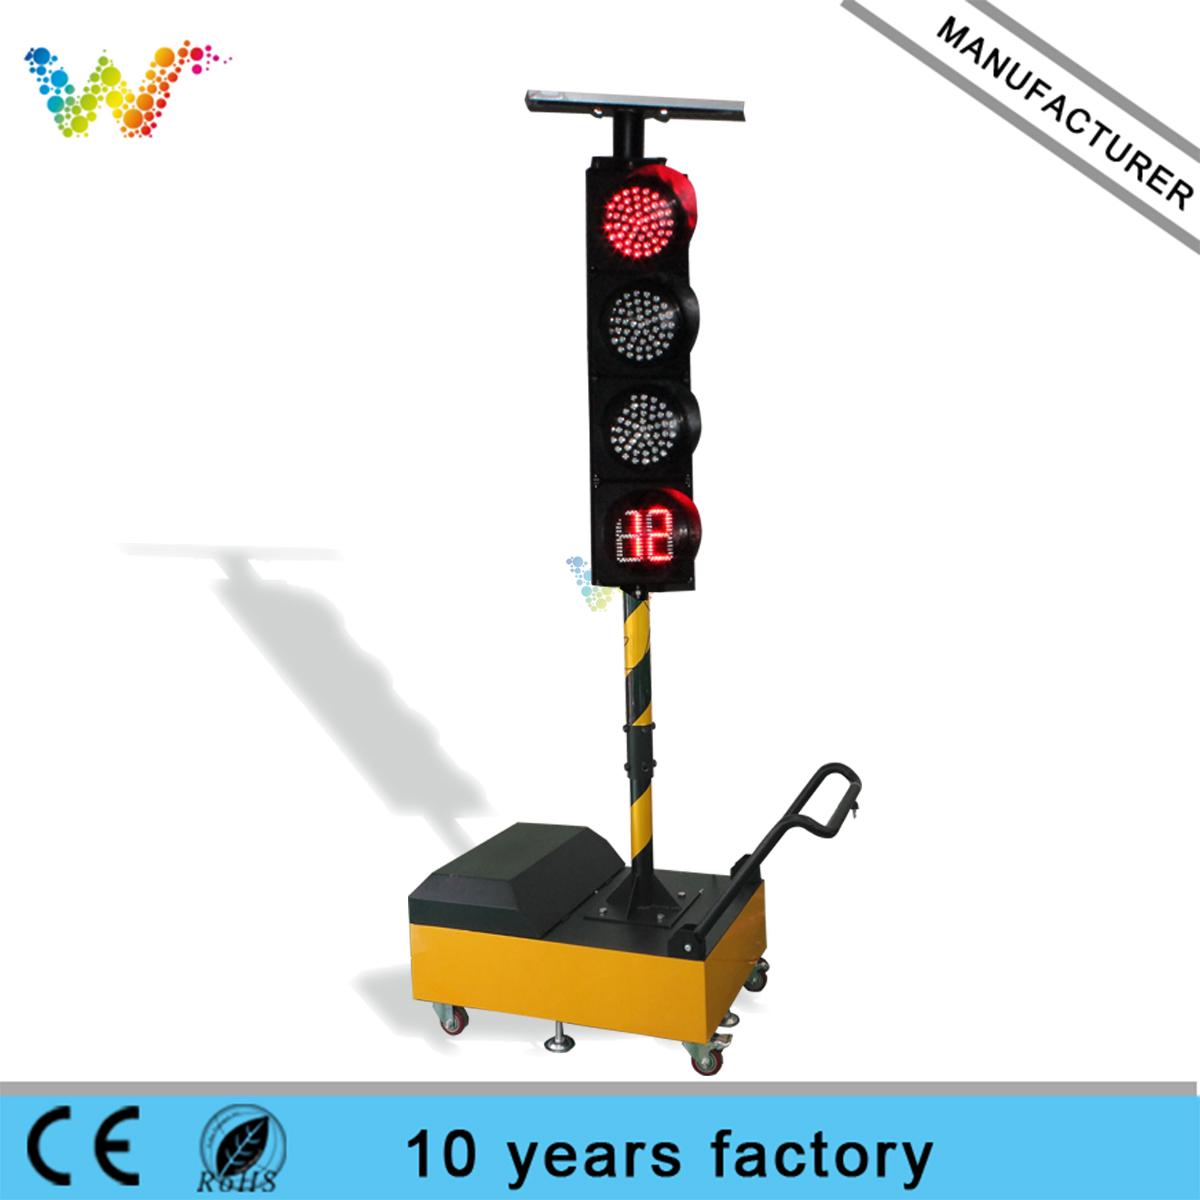 Trolley Remote Control 200mm LED Solar Portable Traffic Light